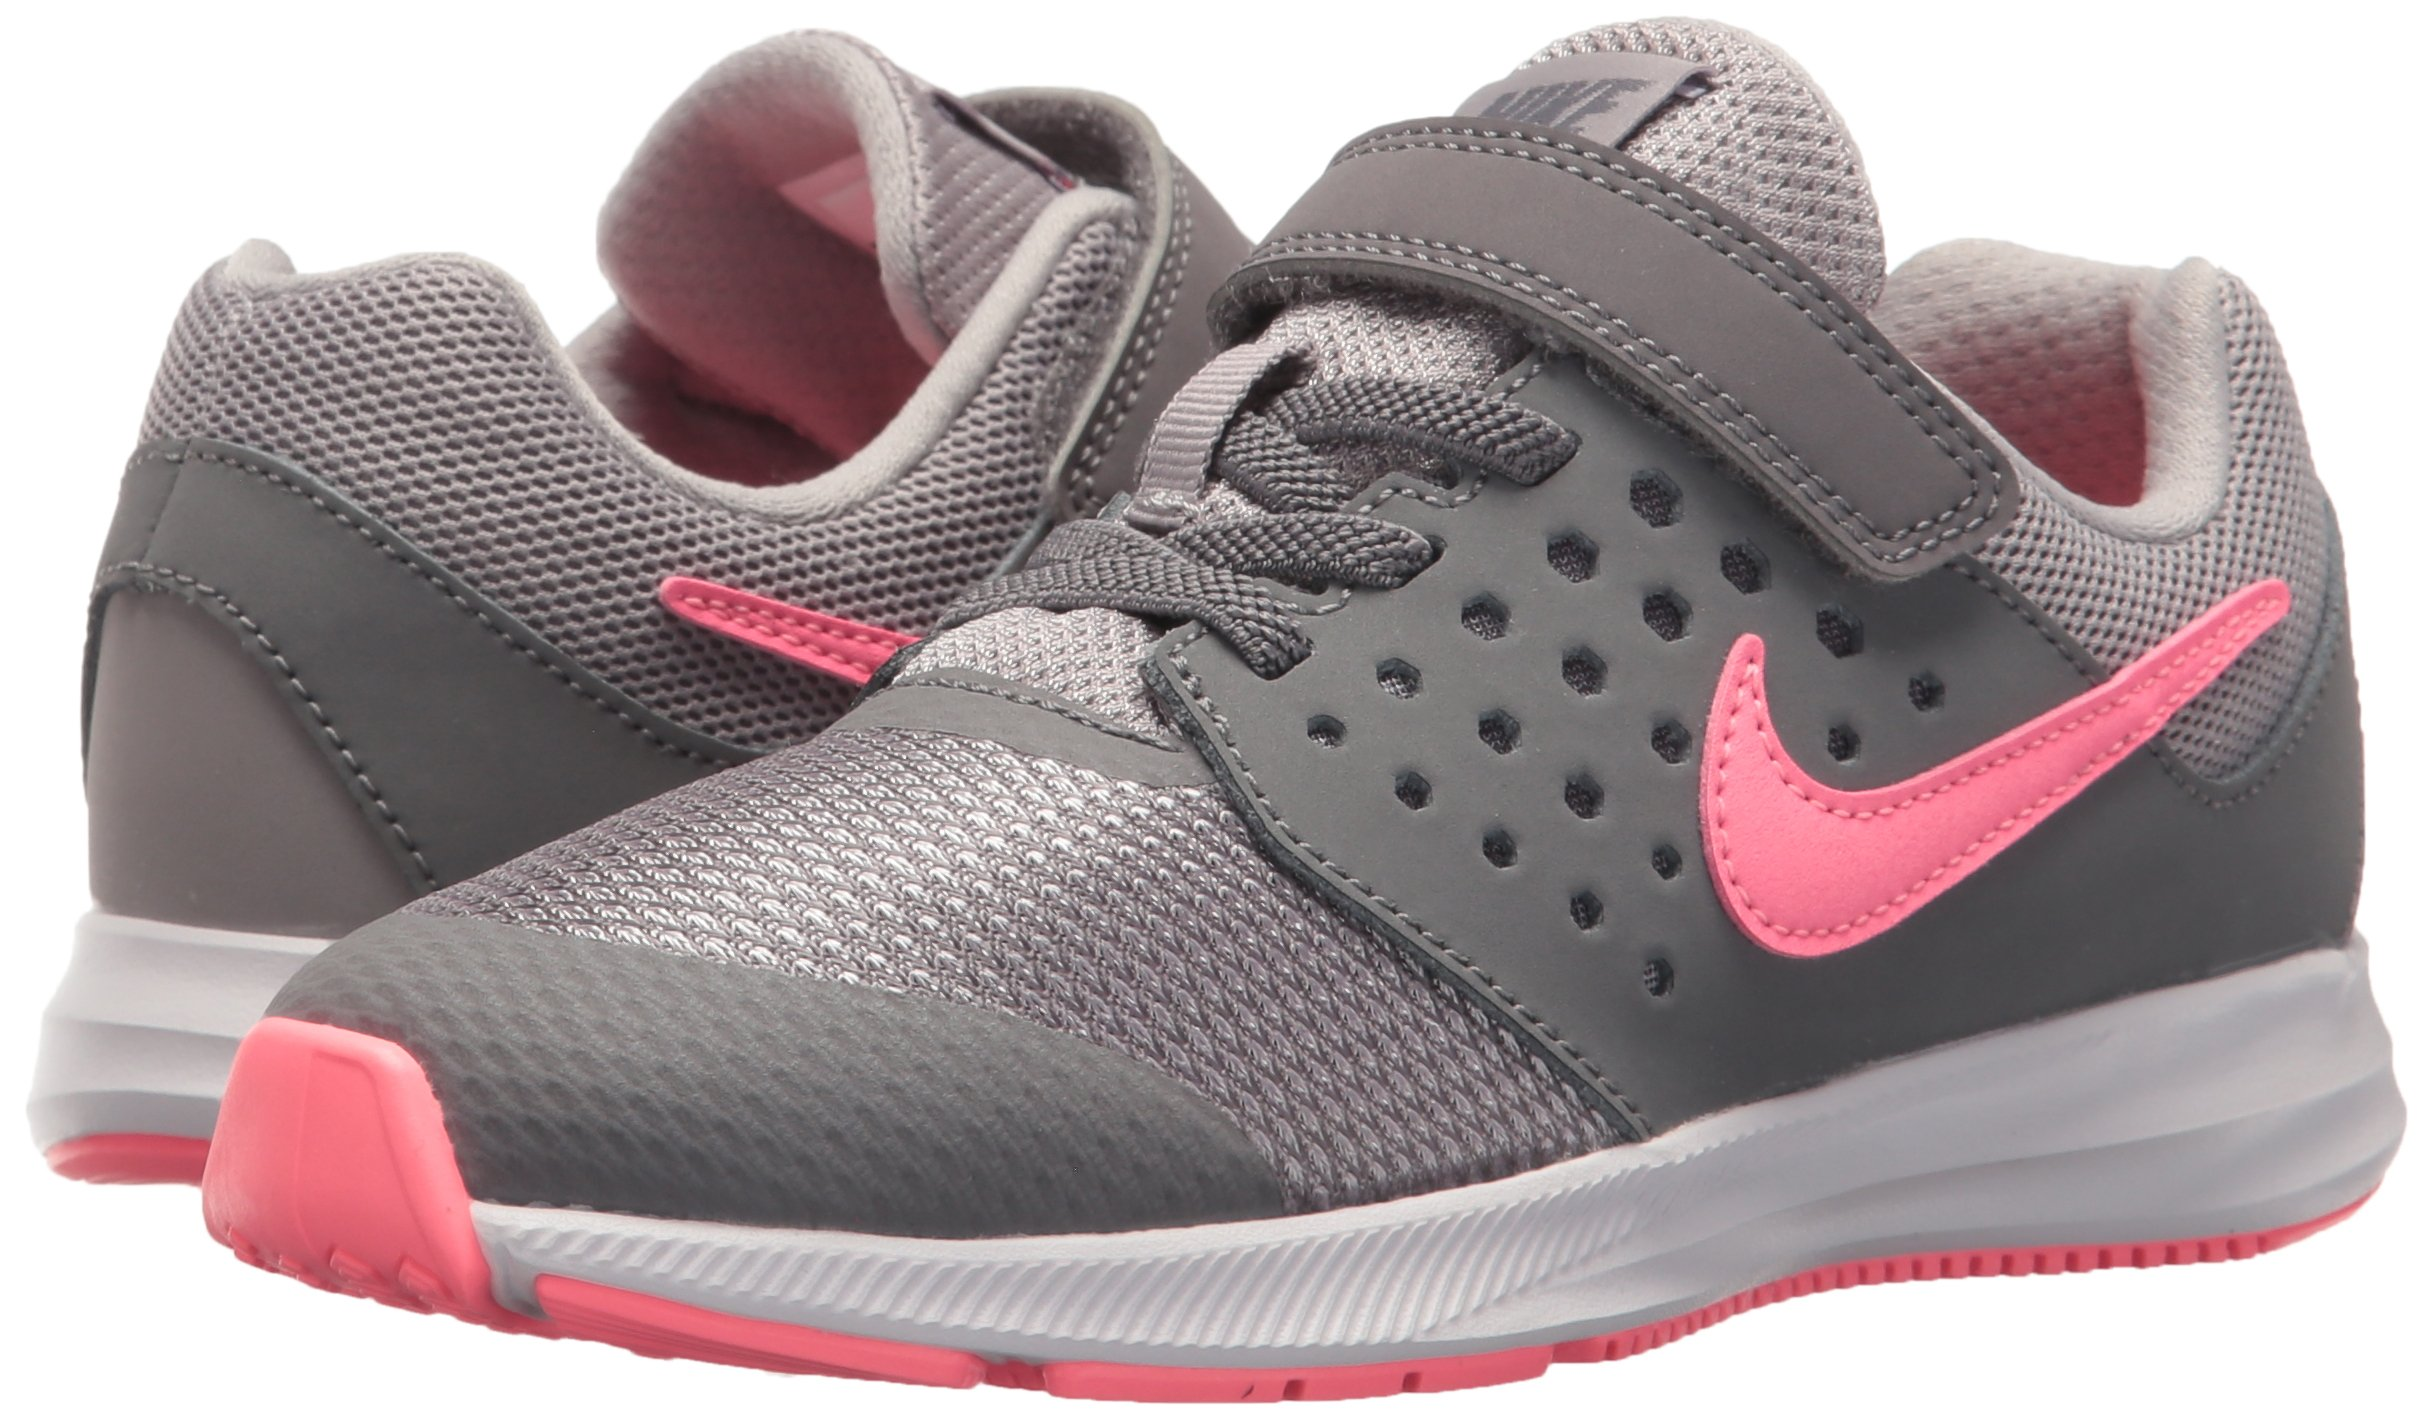 Nike Girls' Downshifter 7 (PSV) Running Shoe, Gunsmoke/Sunset Pulse-Atmosphere Grey, 2 M US Little Kid by Nike (Image #6)